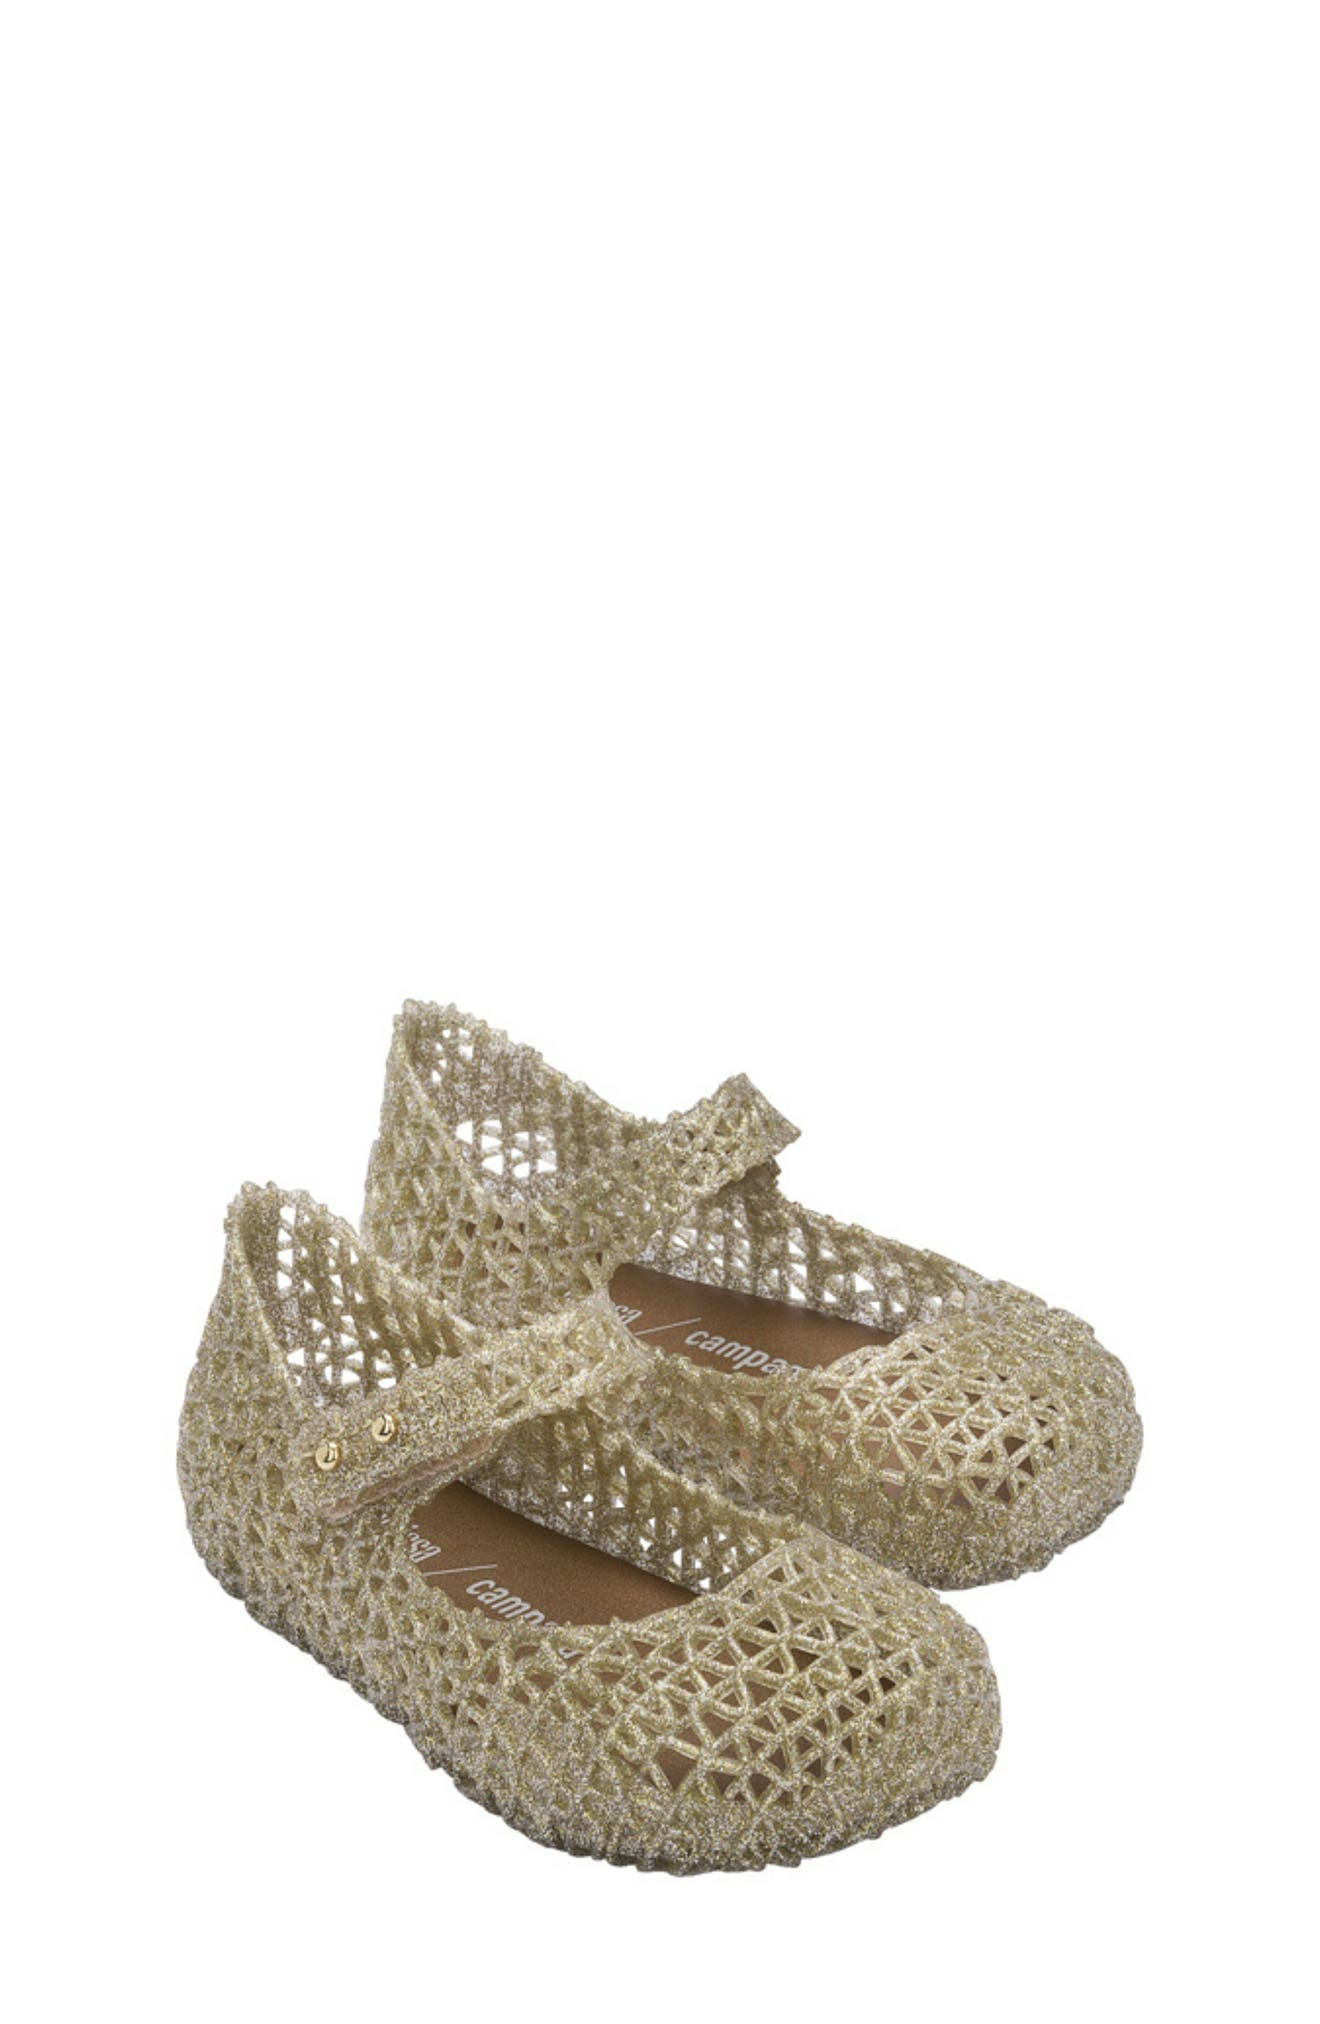 Mini Melissa Mel By Melissa Girls Gold Star Sandals Size 11 New